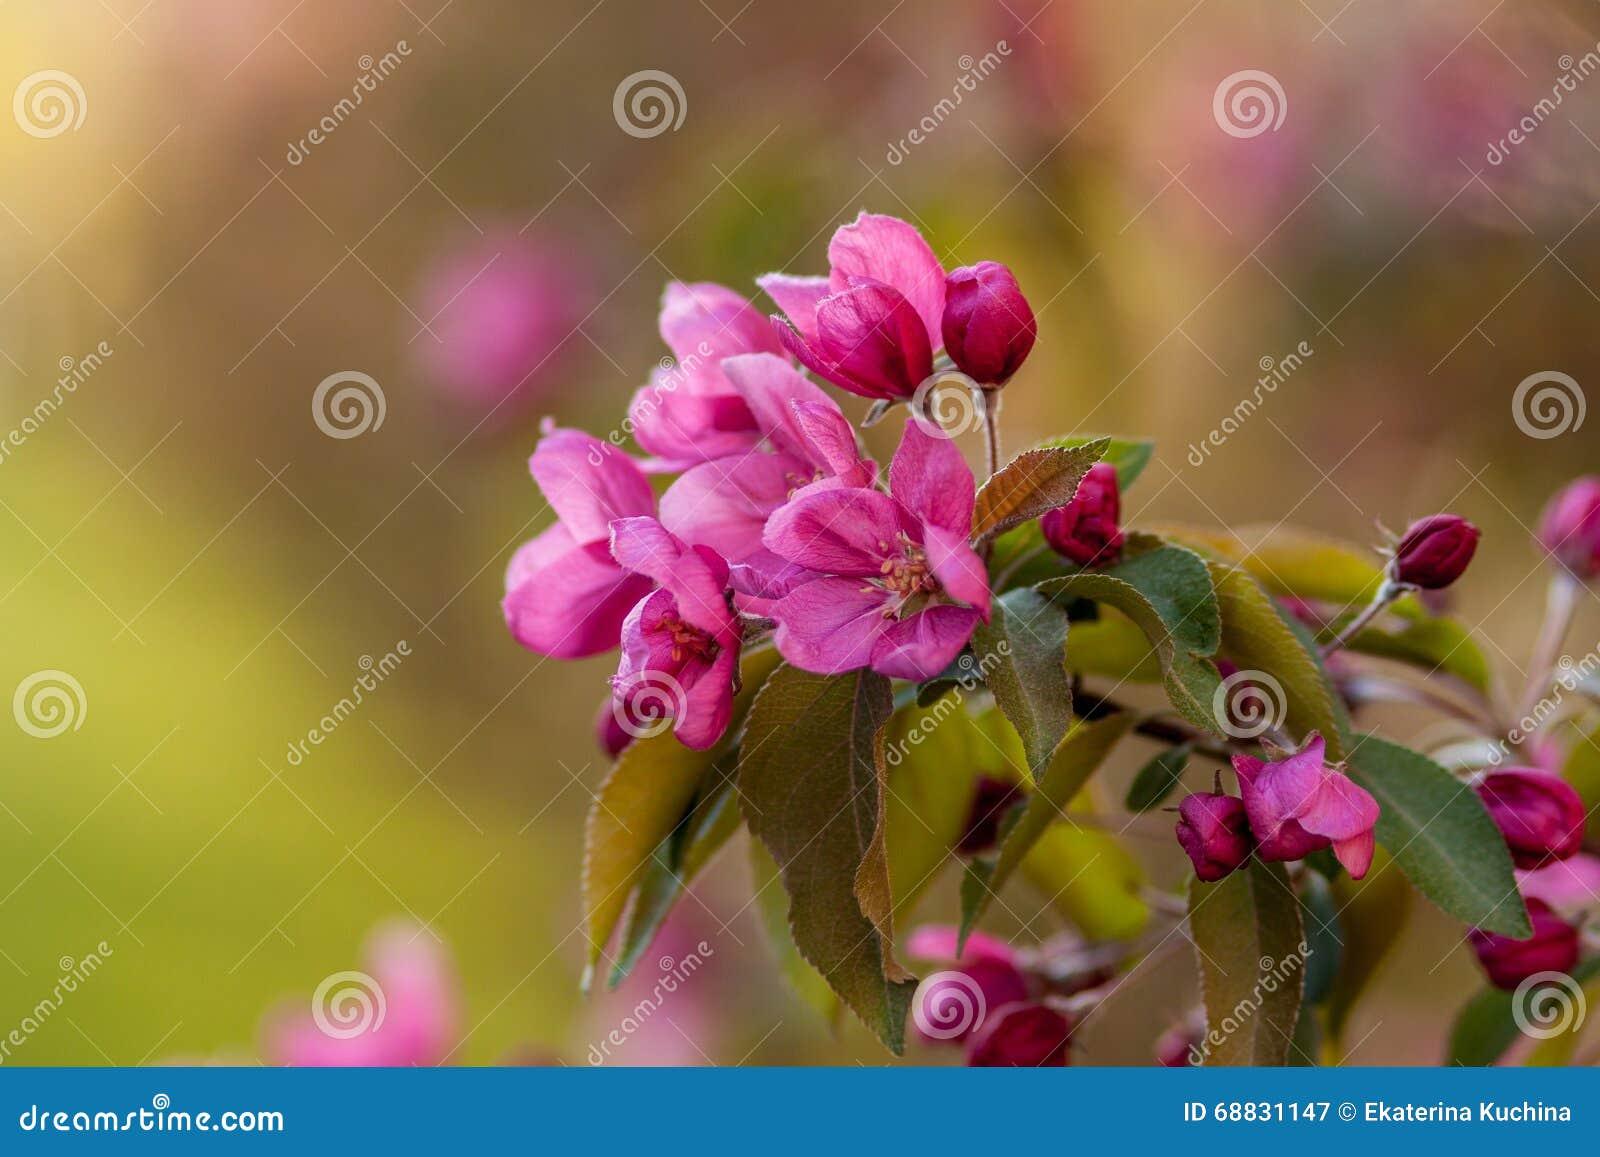 Flowering apple trees pink flowers beautiful color stock image flowering apple trees pink flowers beautiful color mightylinksfo